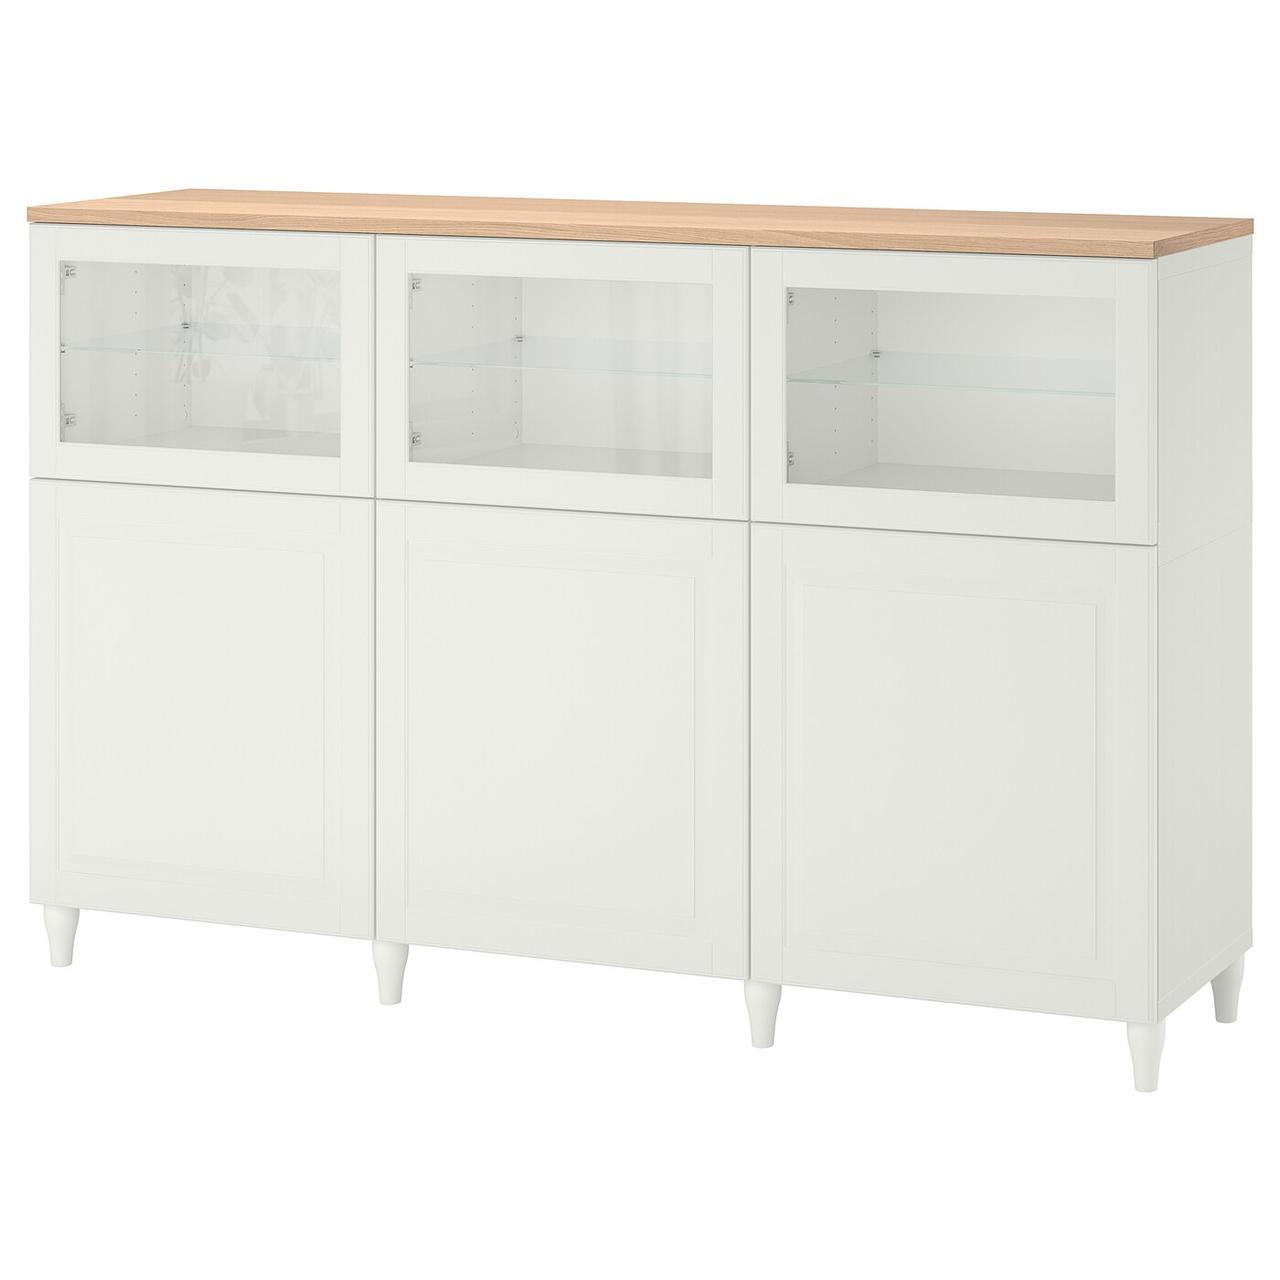 IKEA BESTÅ Комбинация с дверцами белый/Smeviken/Kabbarp белый прозрачное стекло 180x42x114 см